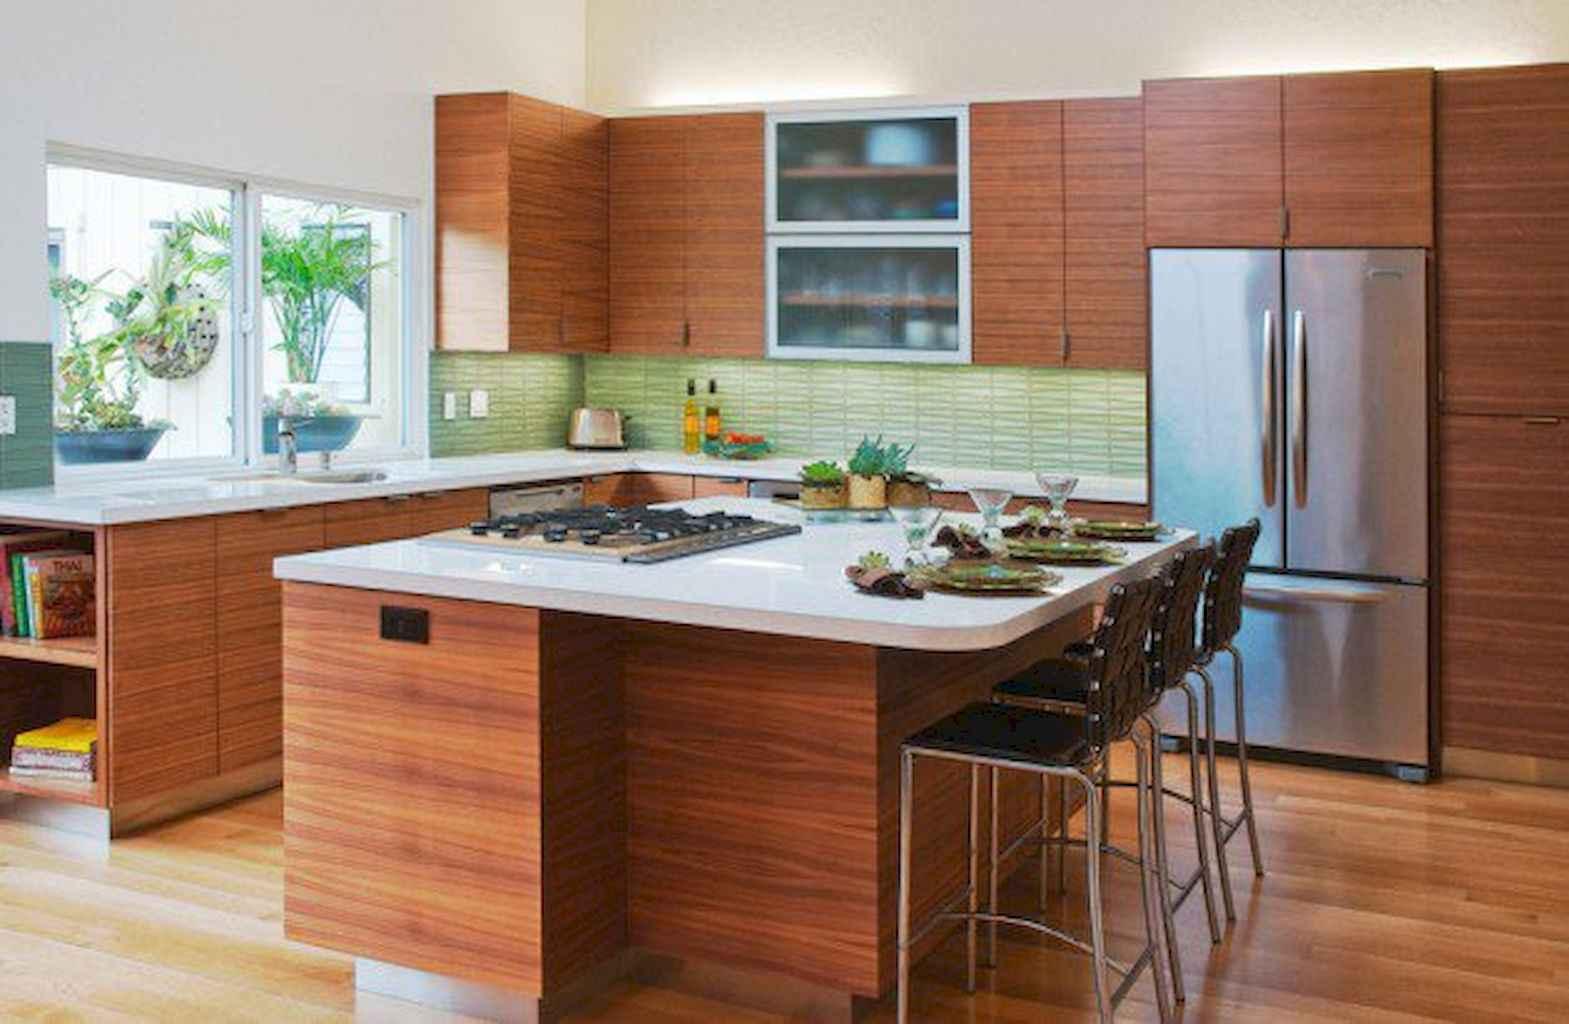 Mid century modern kitchen design ideas (3)